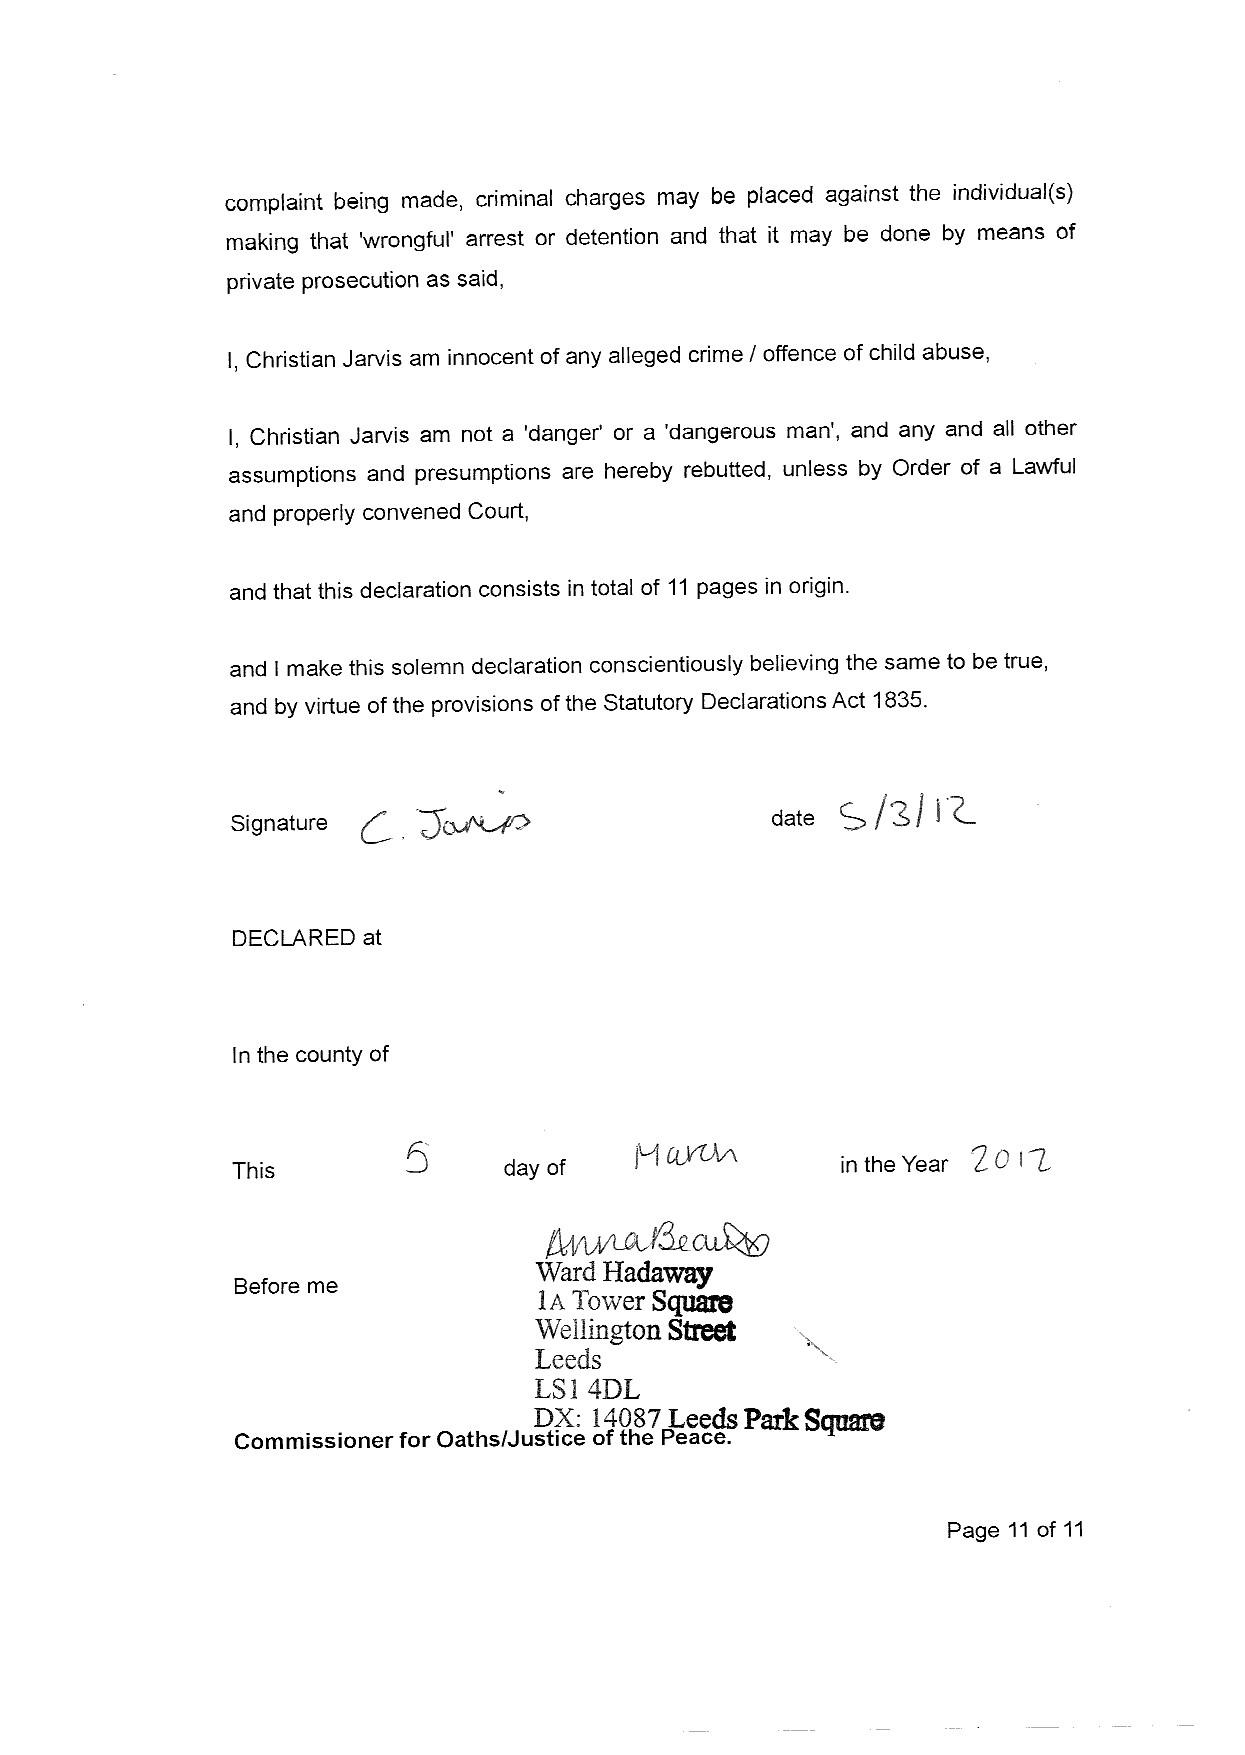 Statutory Declaration – The Jarvis Family